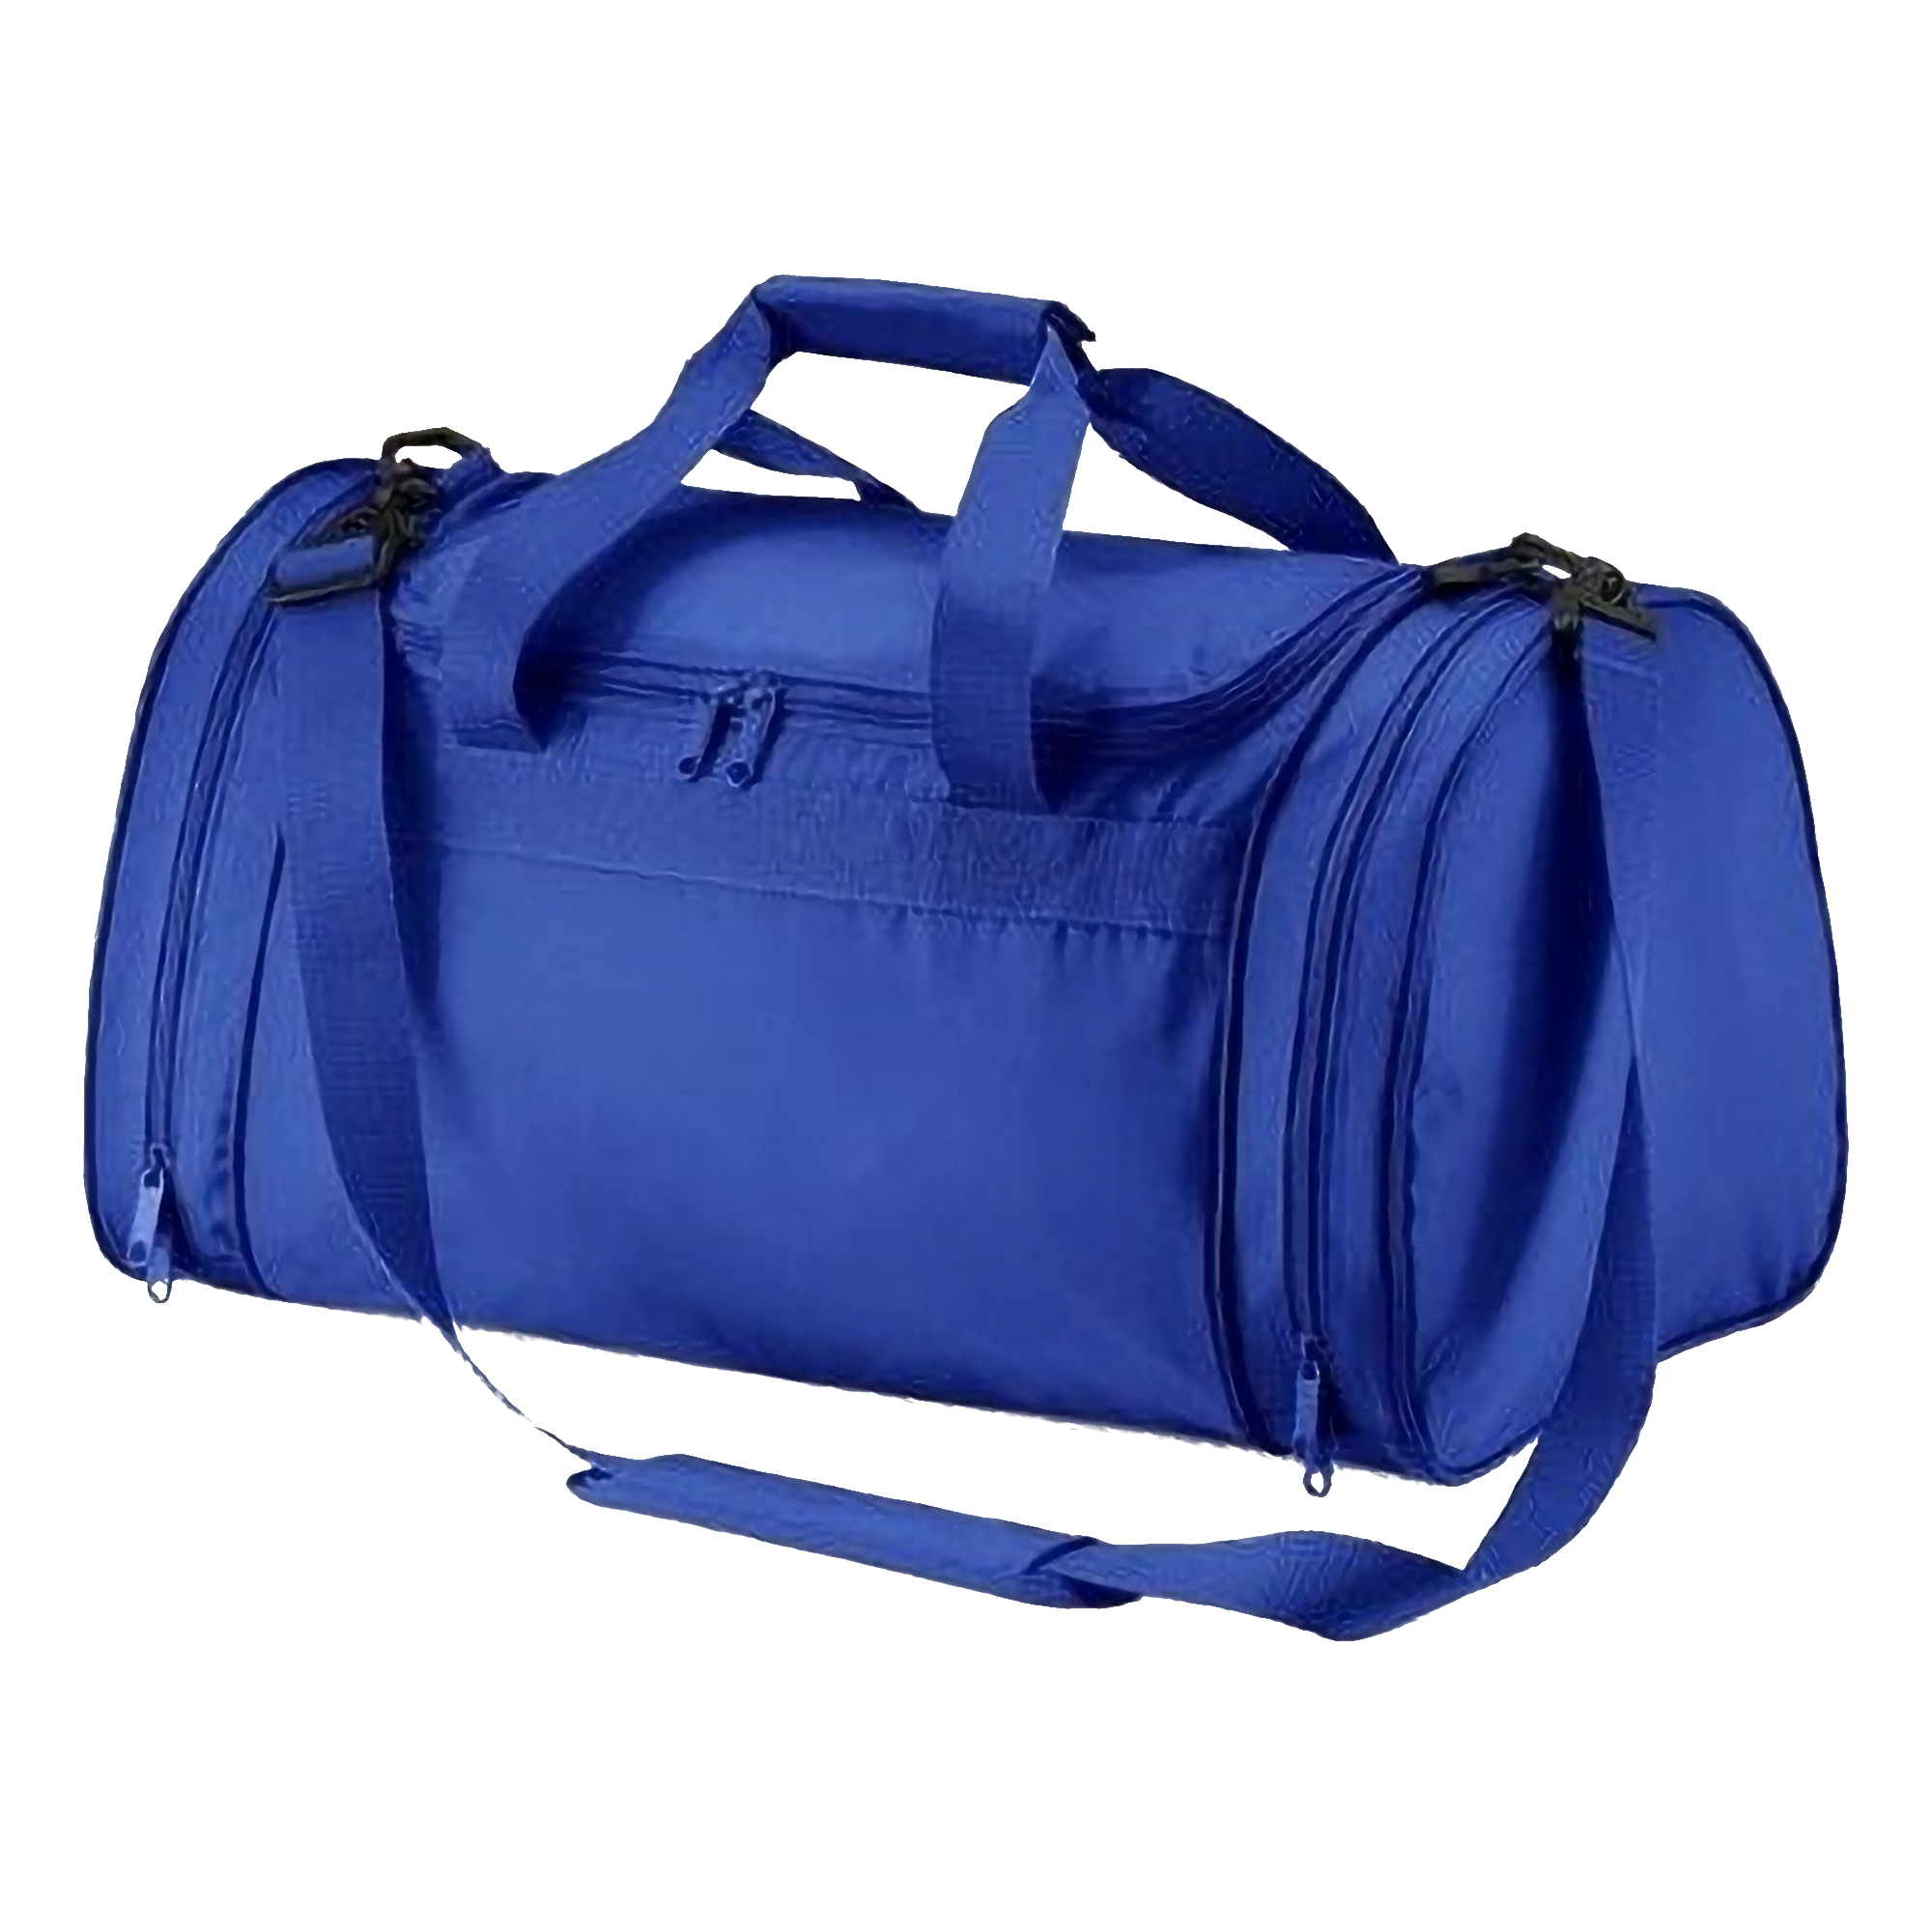 Quadra Sports Holdall Duffle Bag - 32 Litres (One Size) (Bright Royal)